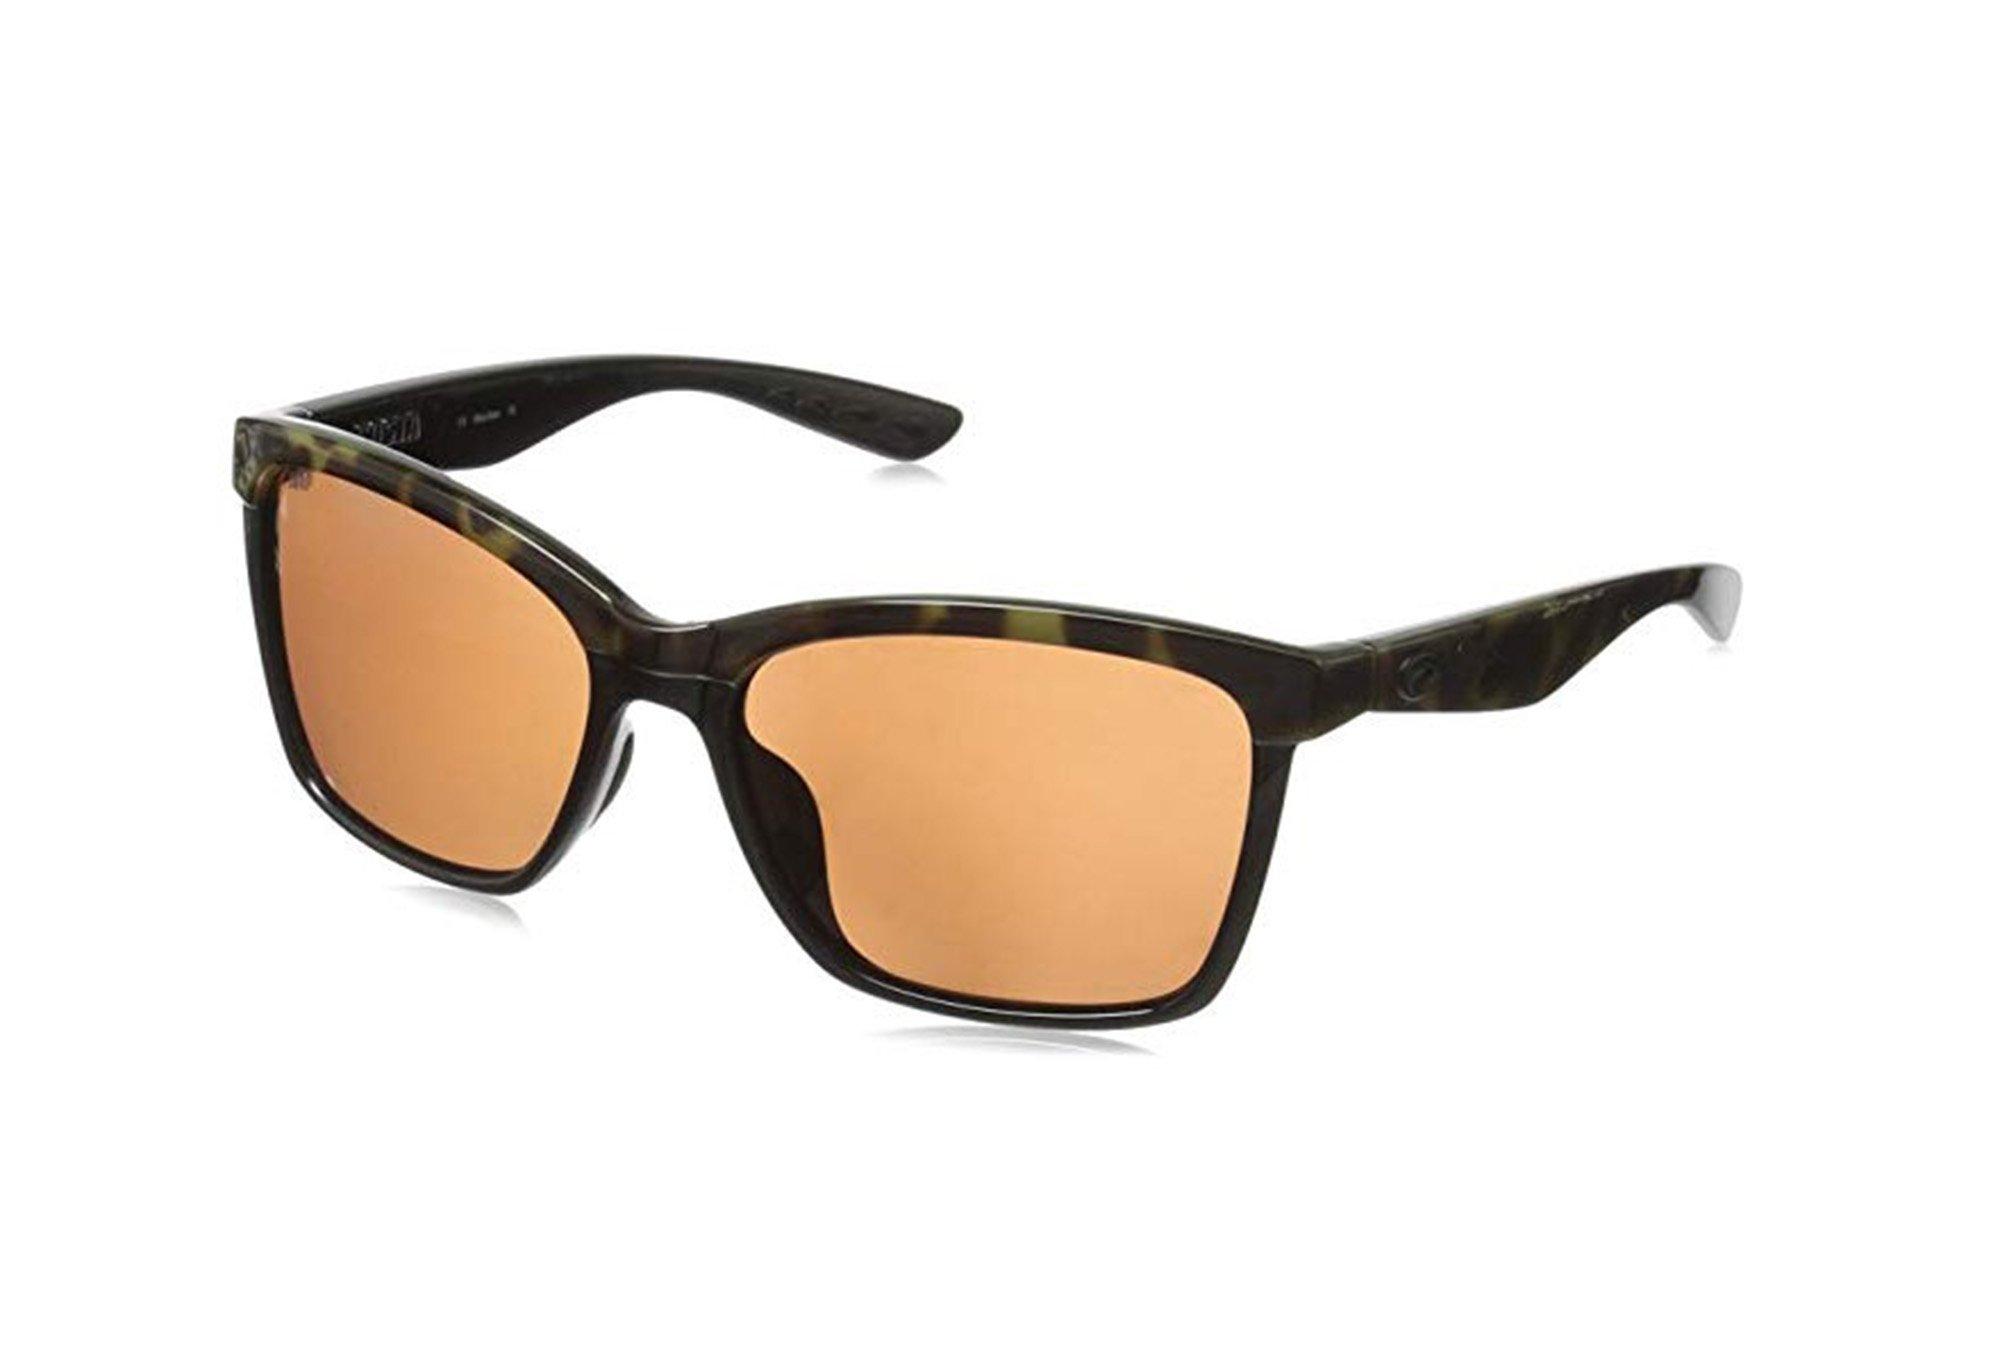 Costa Anaa Polarized Sunglasses